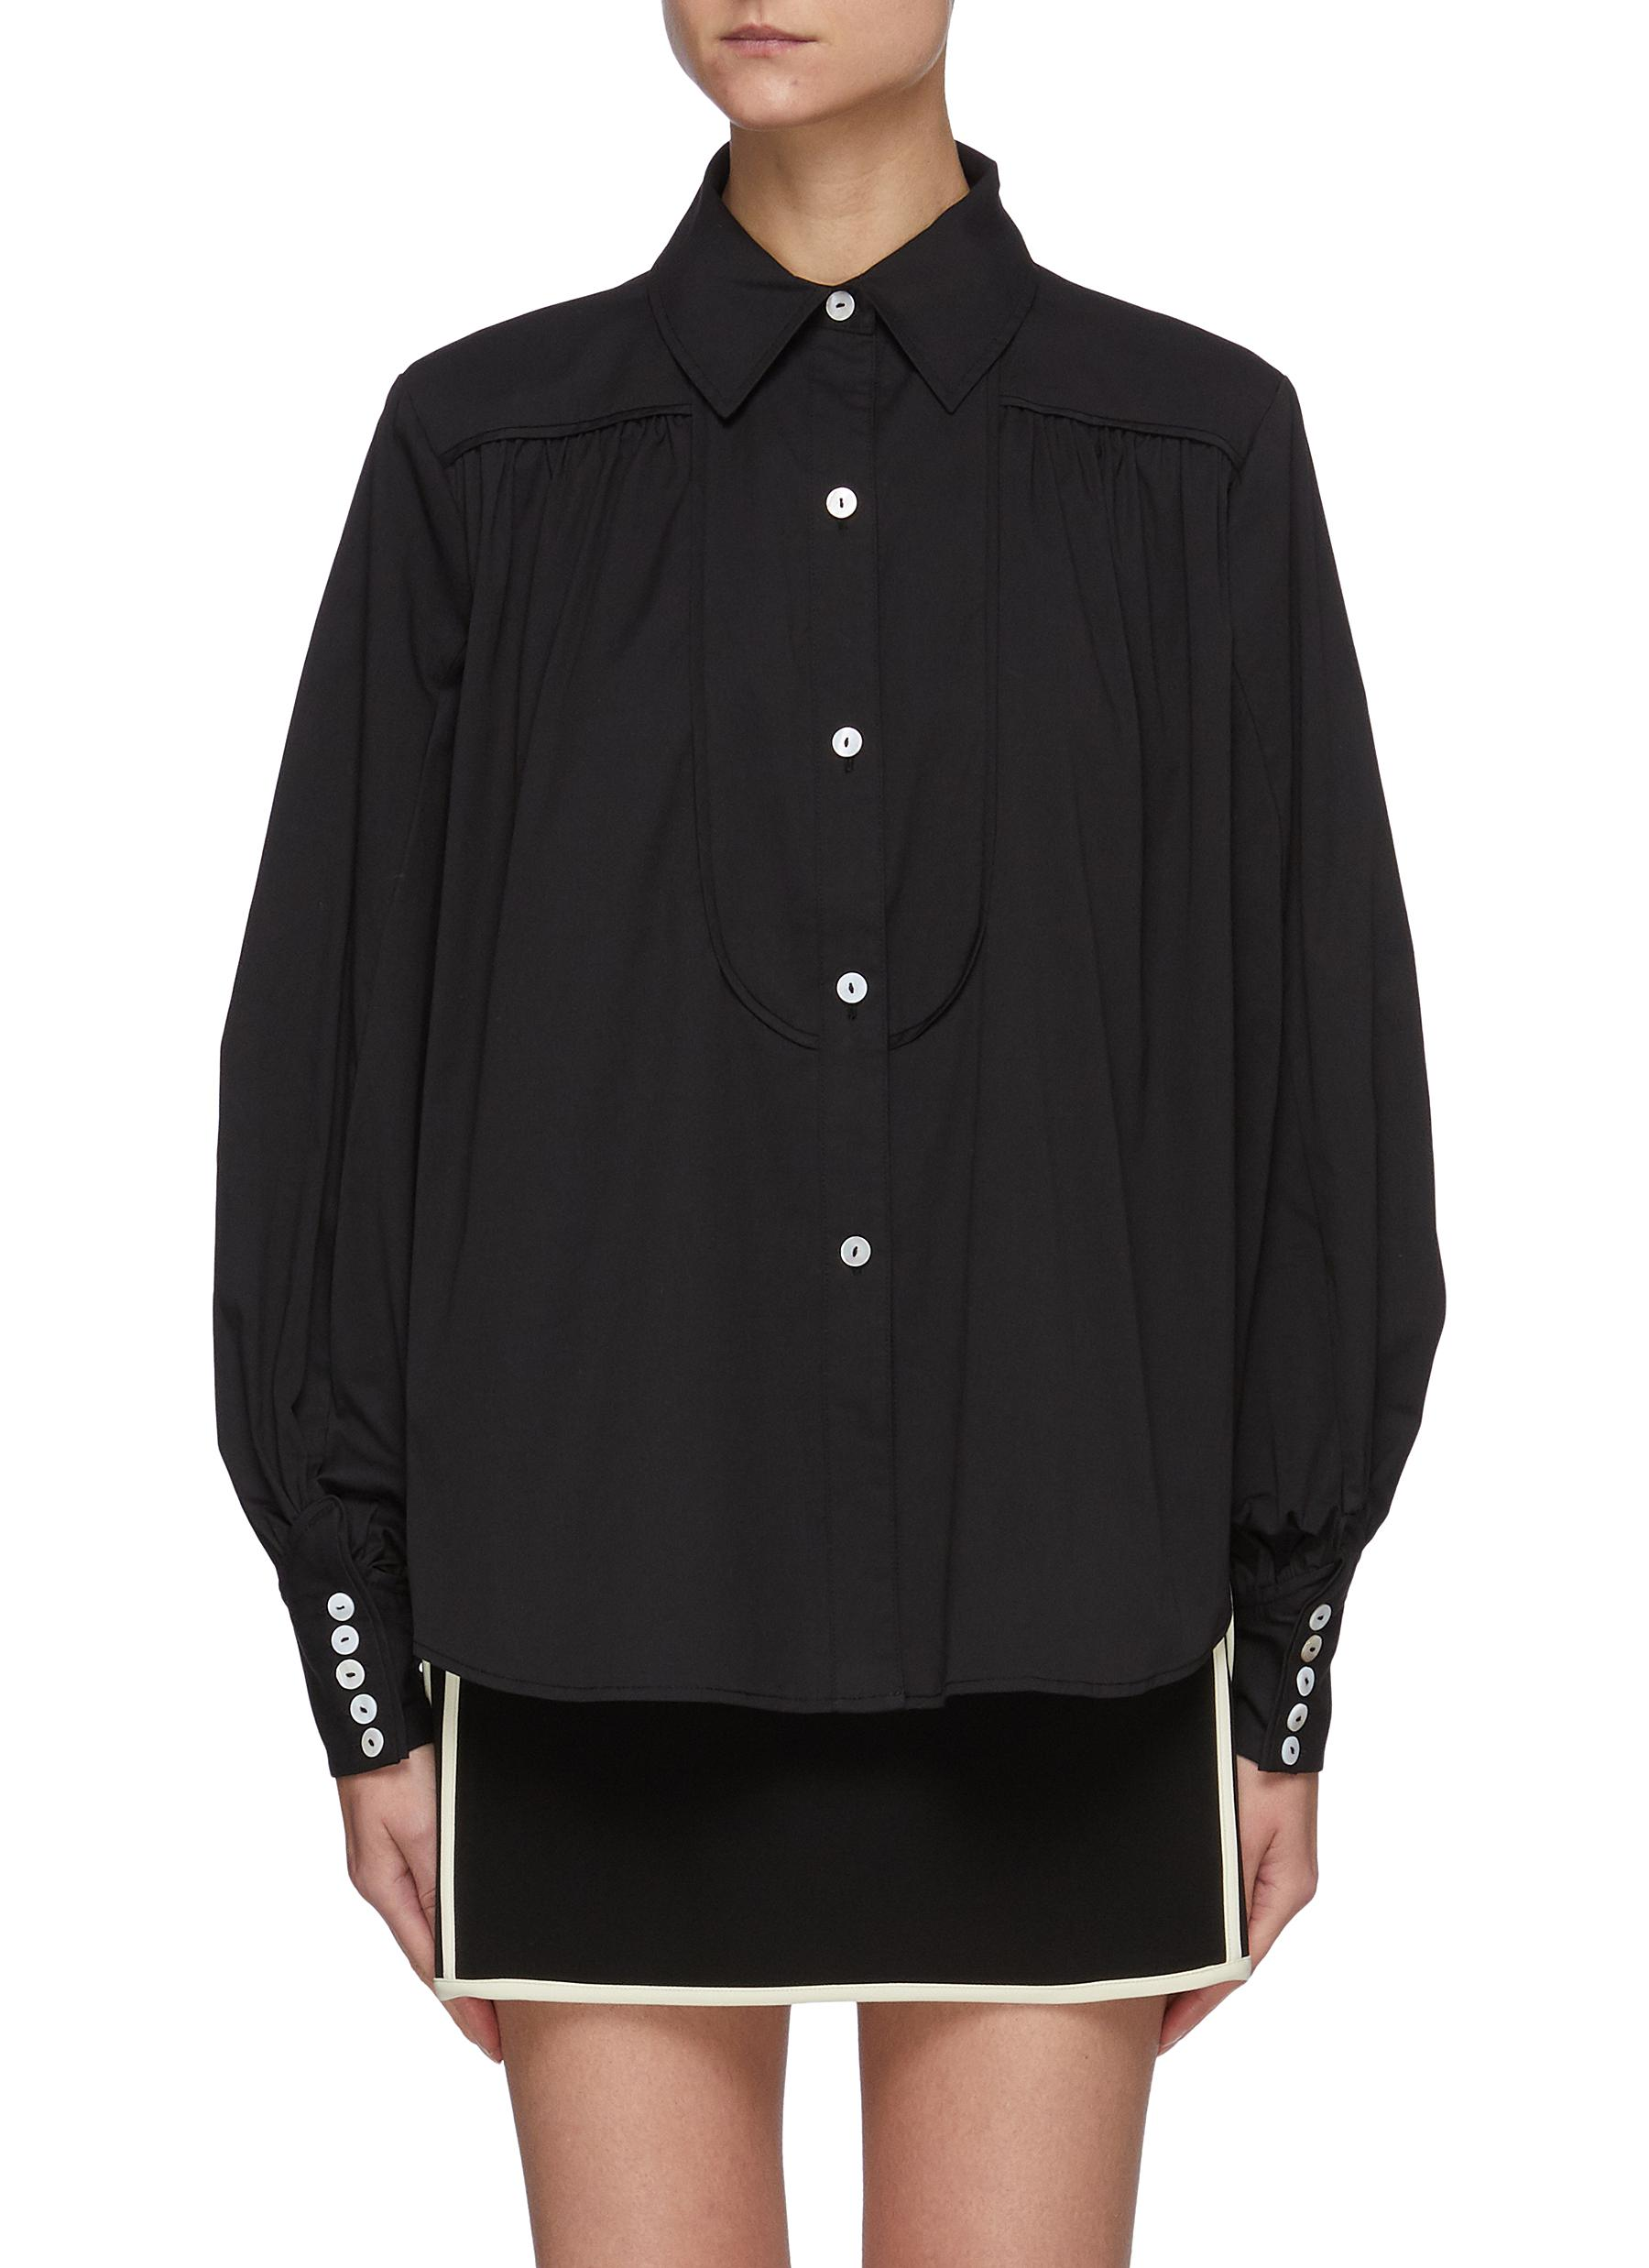 Bell Sleeves Black Shirt